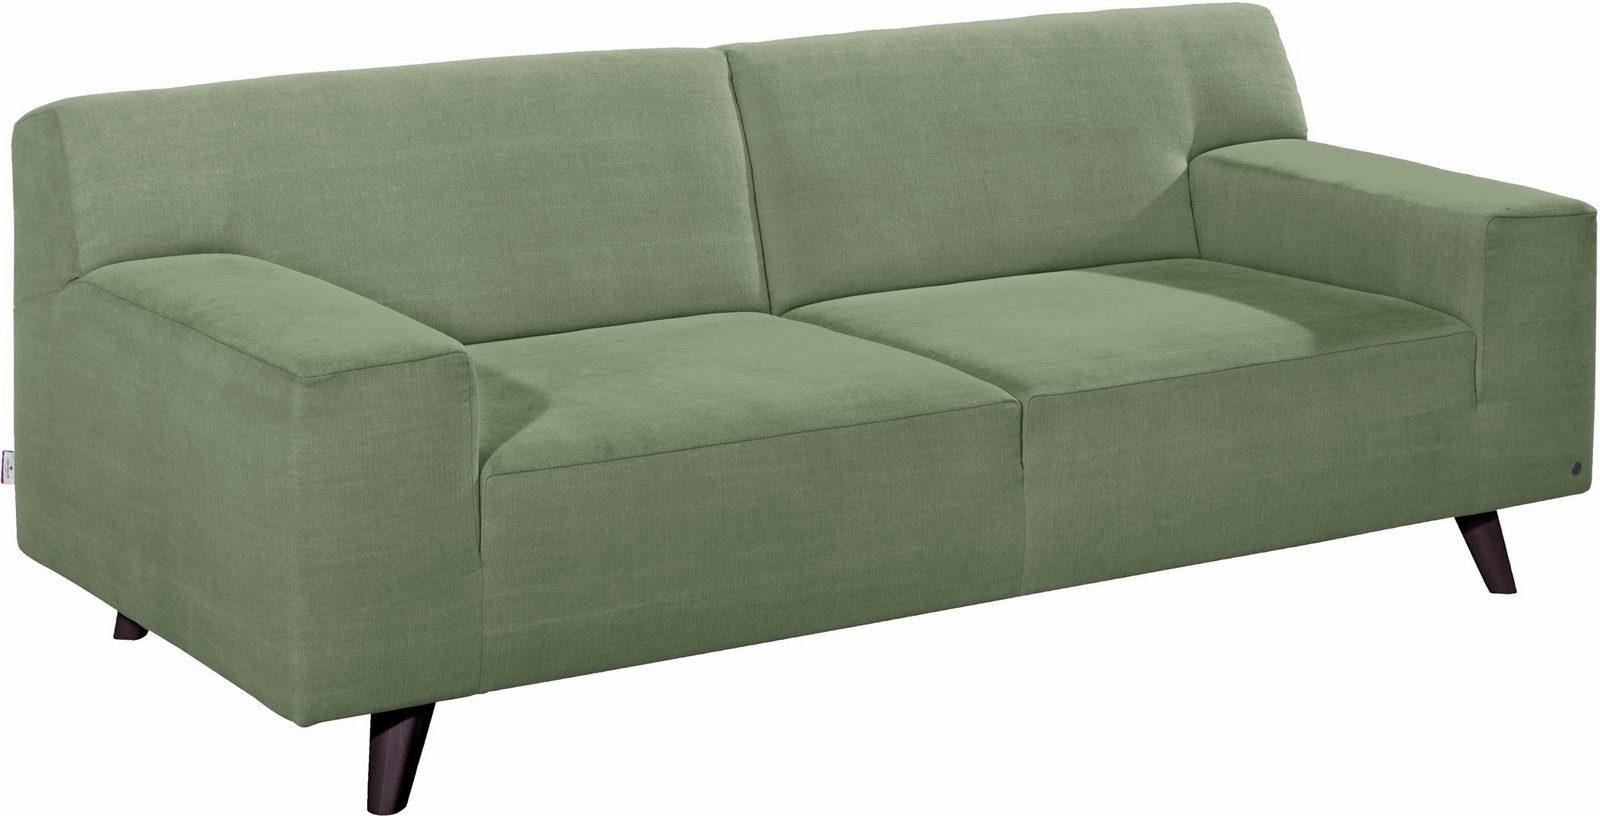 TOM TAILOR 2,5-Sitzer Sofa »NORDIC PURE« im Retrolook, Füße wengefarben